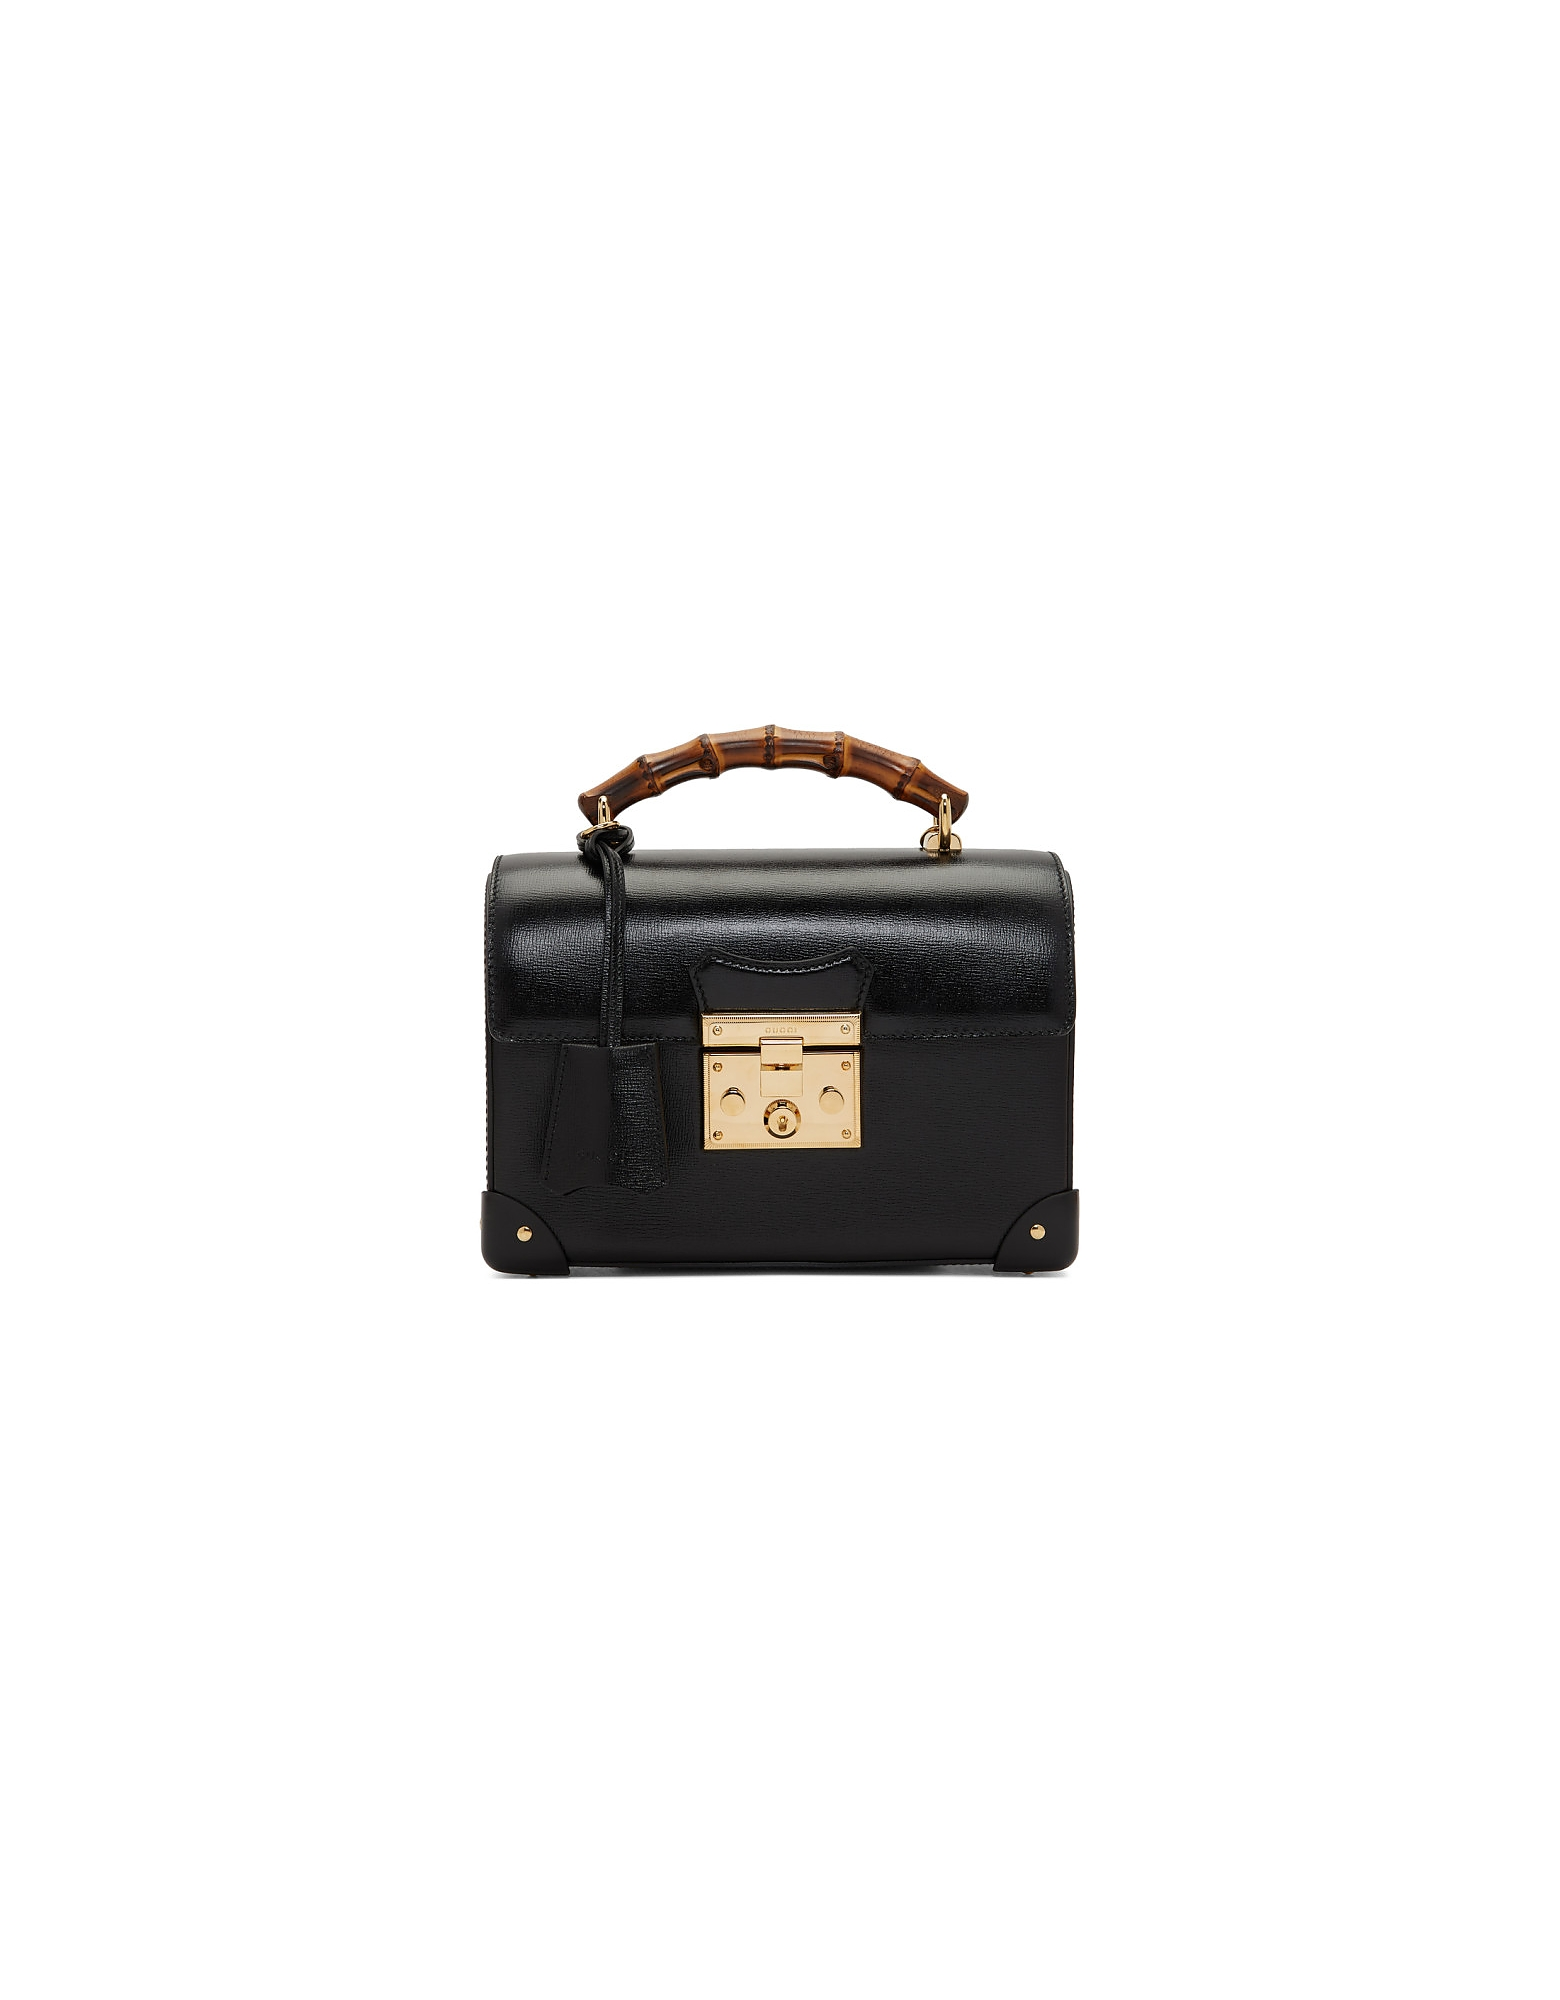 Gucci Designer Handbags, Black Small Bamboo Padlock Bag